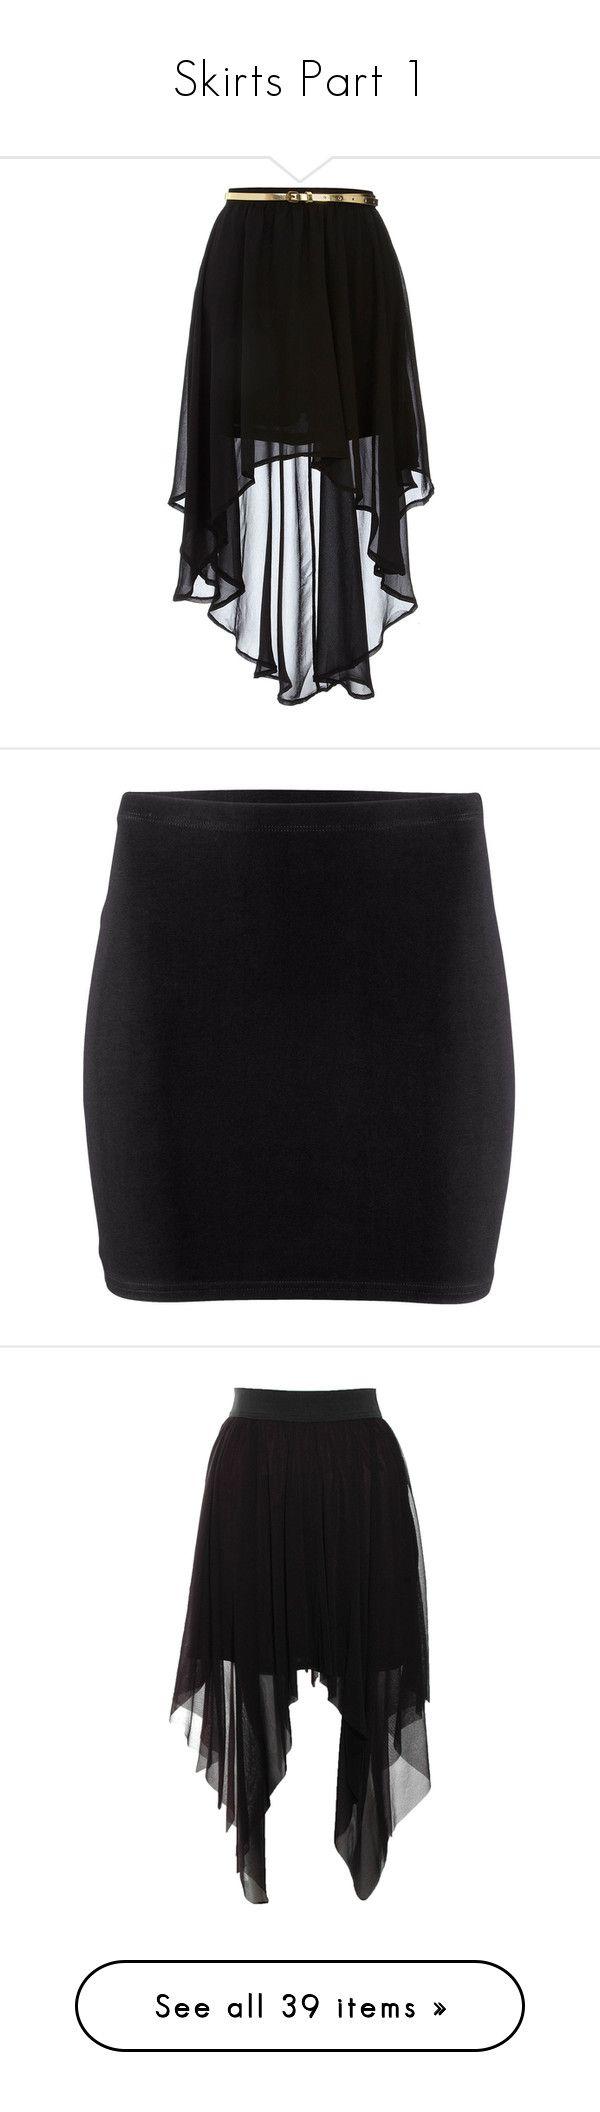 """Skirts Part 1"" by lorene-love ❤ liked on Polyvore featuring skirts, mini skirts, bottoms, saias, faldas, black, hi low skirt, asymmetrical skirt, high waisted asymmetrical skirt and high rise skirts"